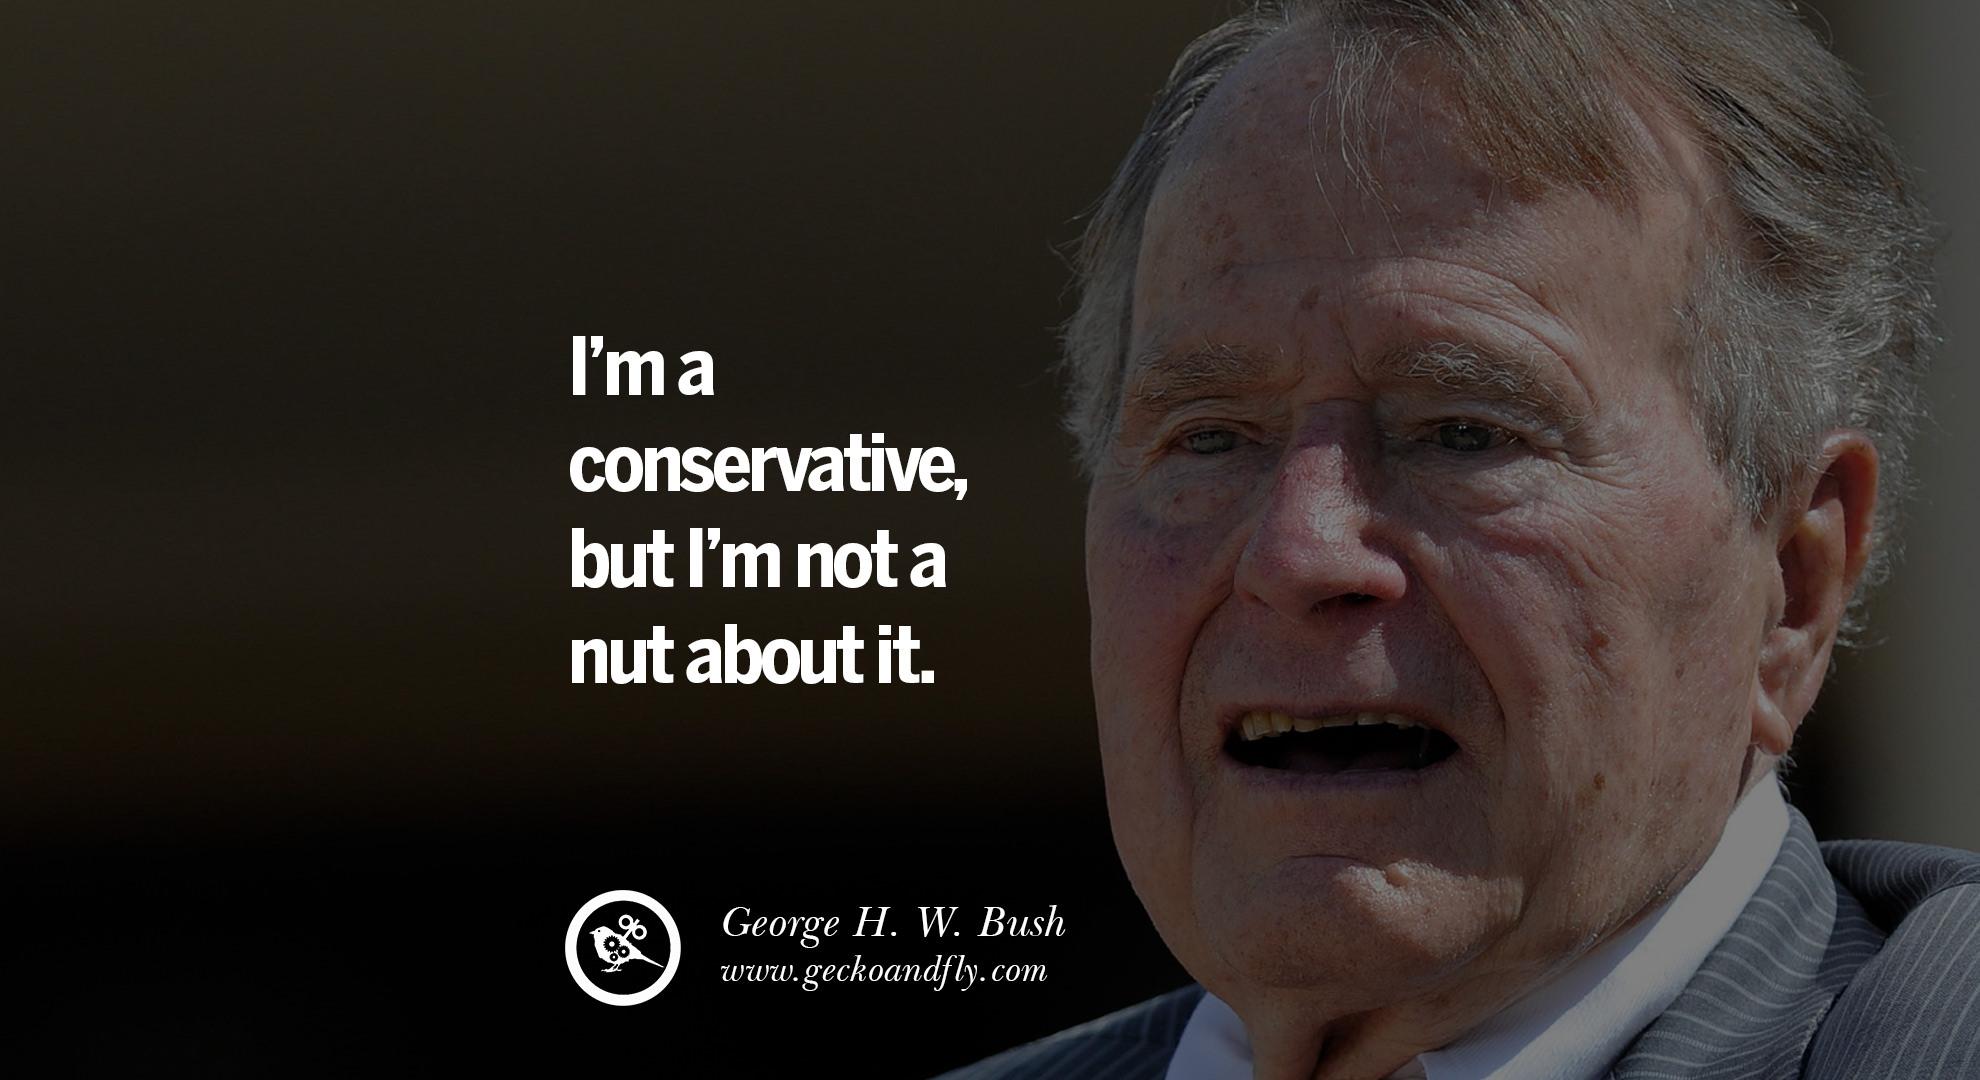 Famous George HW Bush Quotes on Freemason Illuminati and